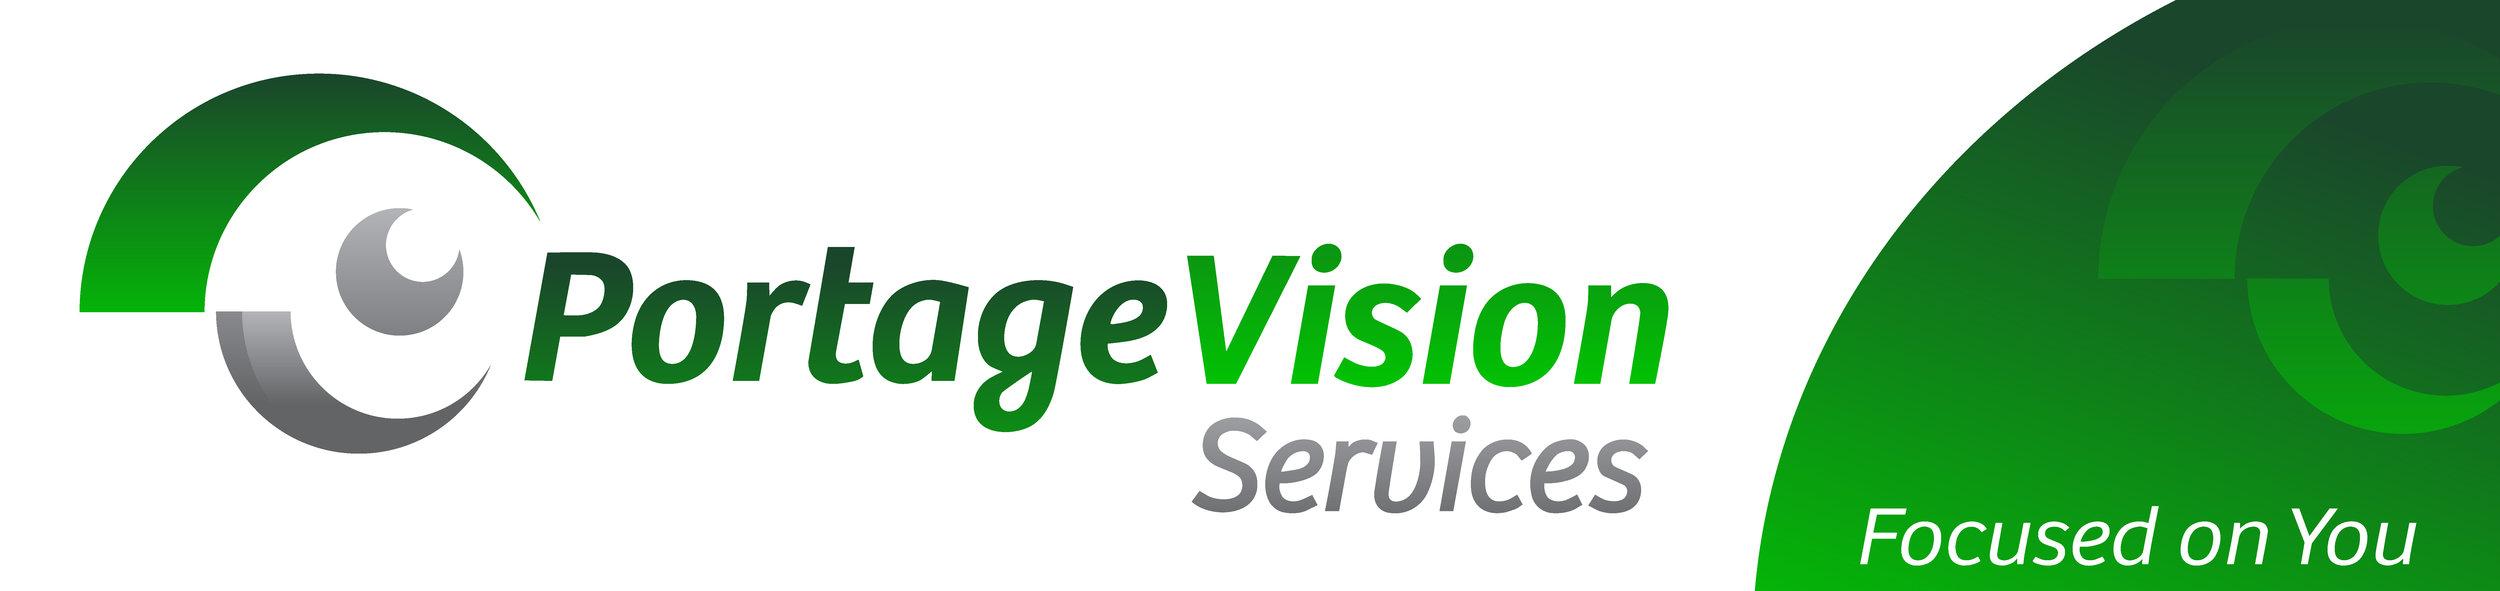 Exhibition sponsor: Portage Vision Services